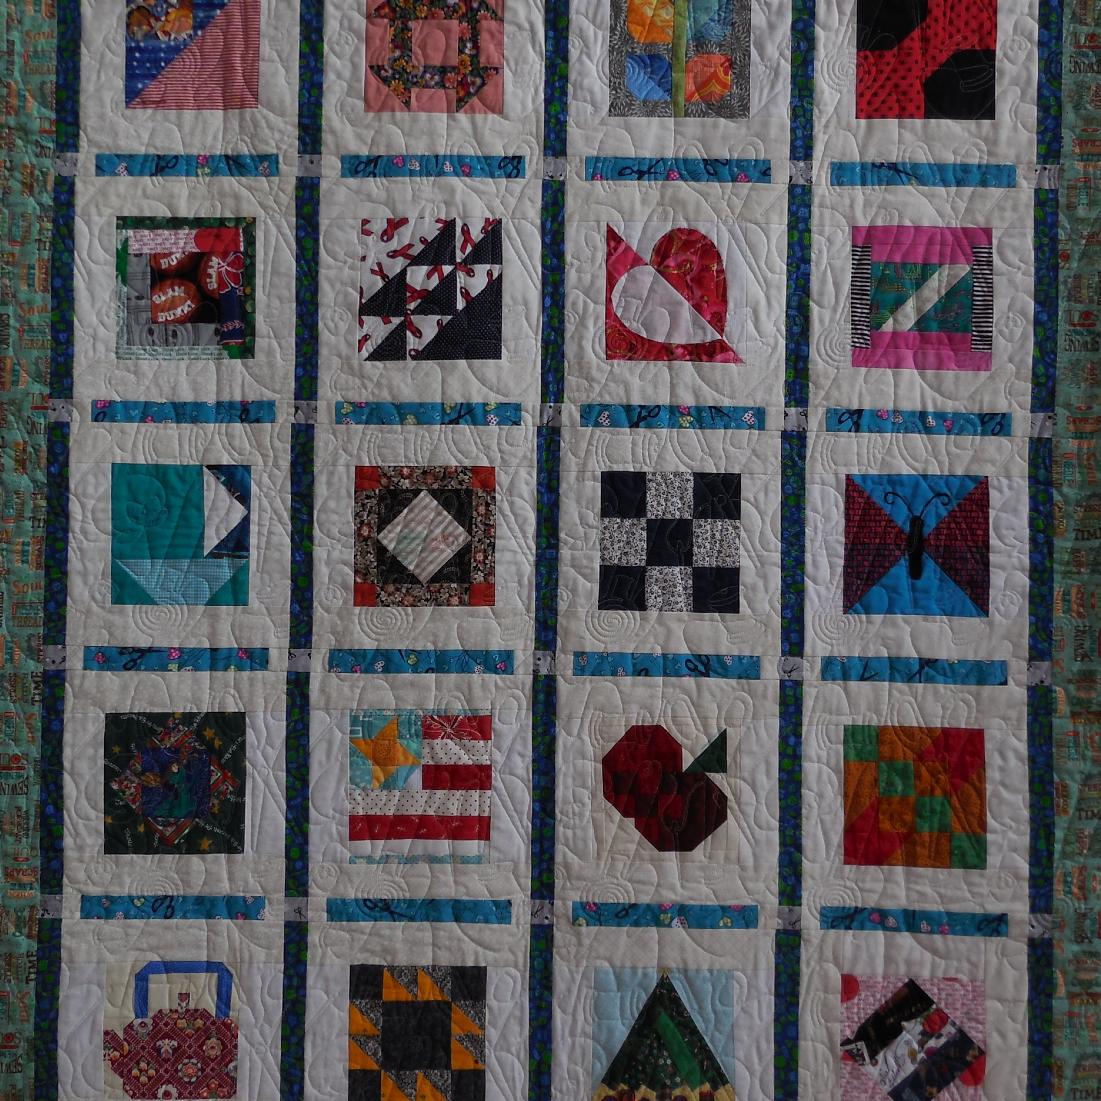 22-279 Sewing Sisters